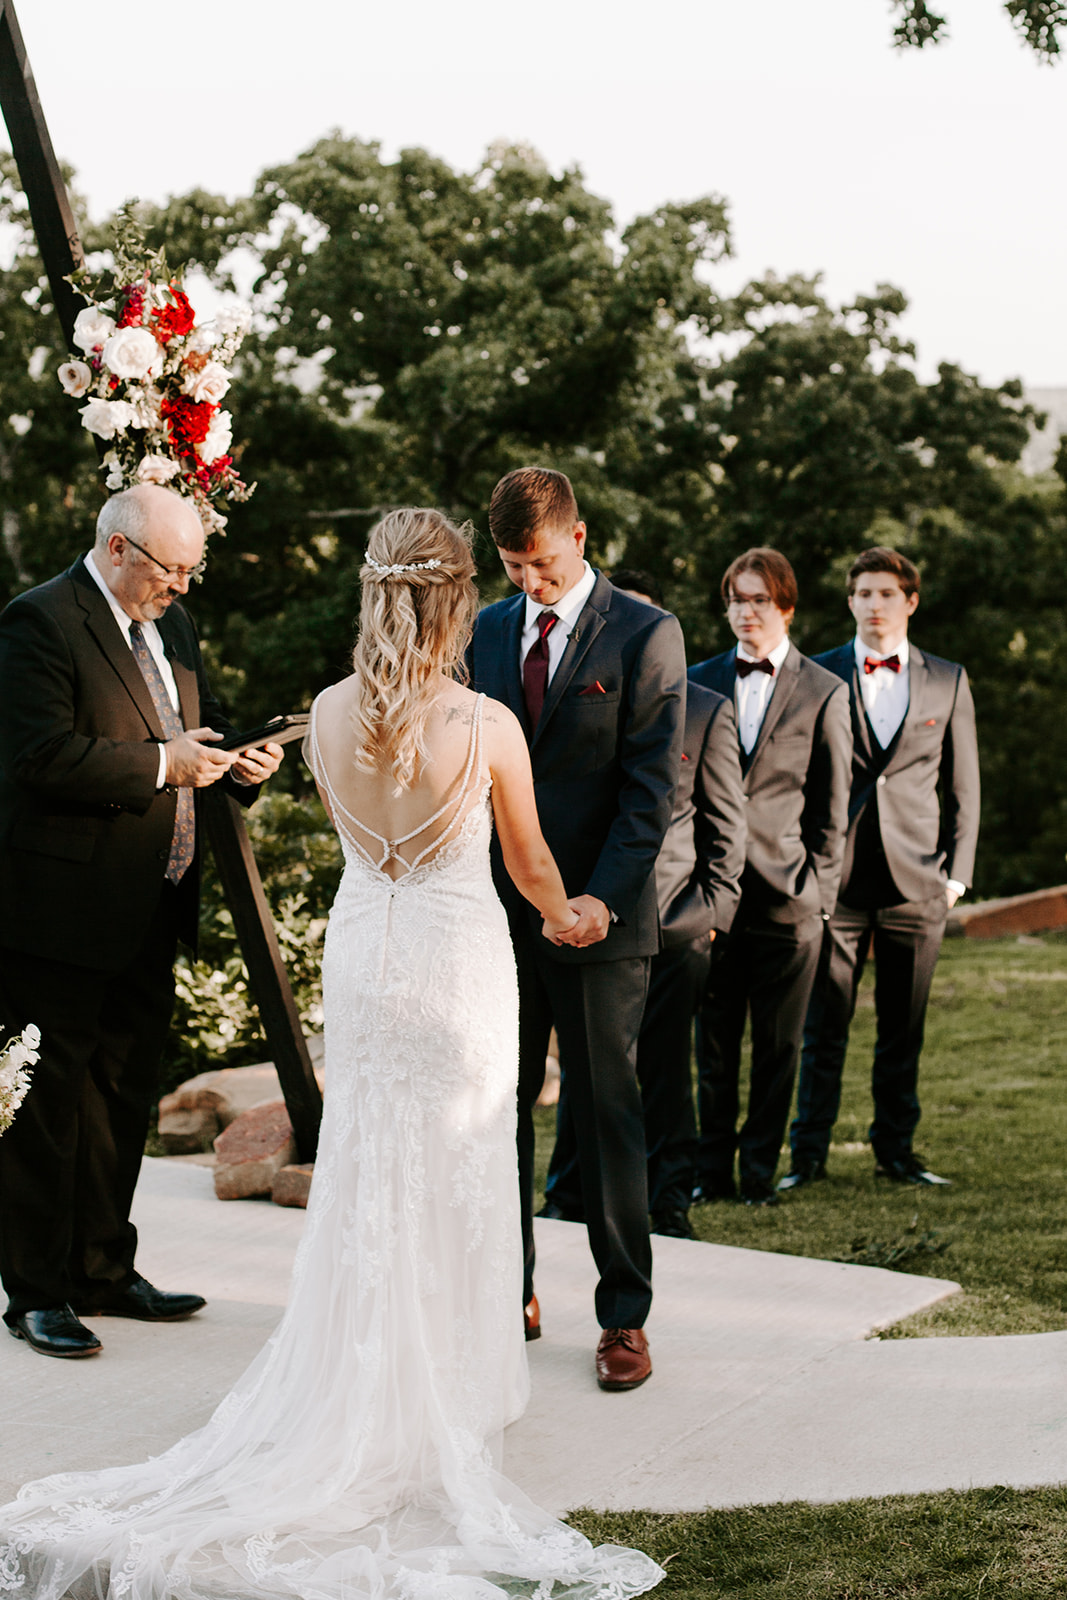 Wedding Venues in Tulsa white barn Dream Point Ranch 36.jpg